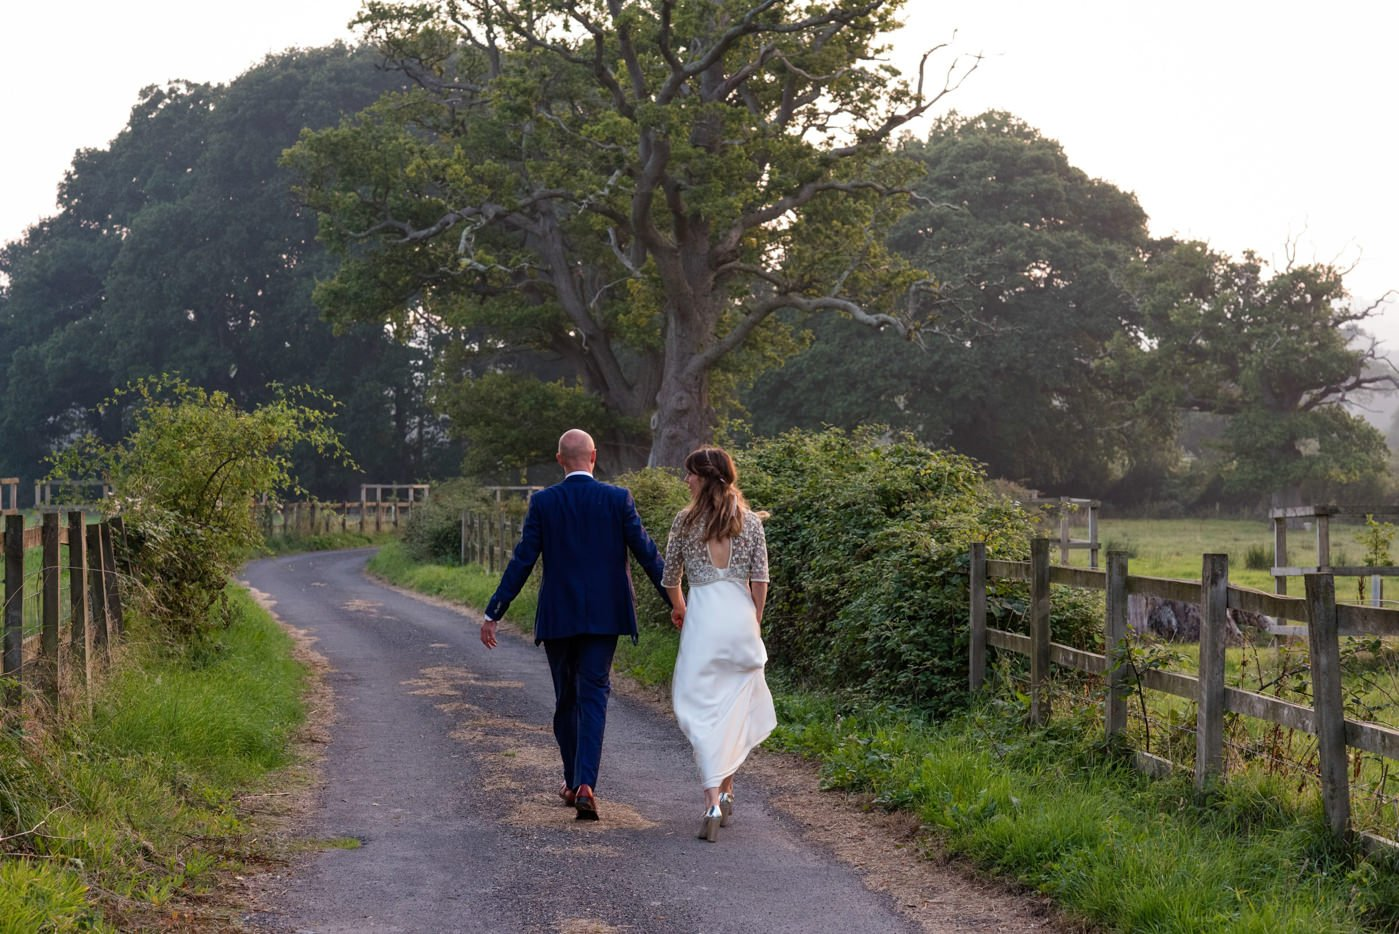 bignor-park-wedding-photography-robyn-and-tom-100